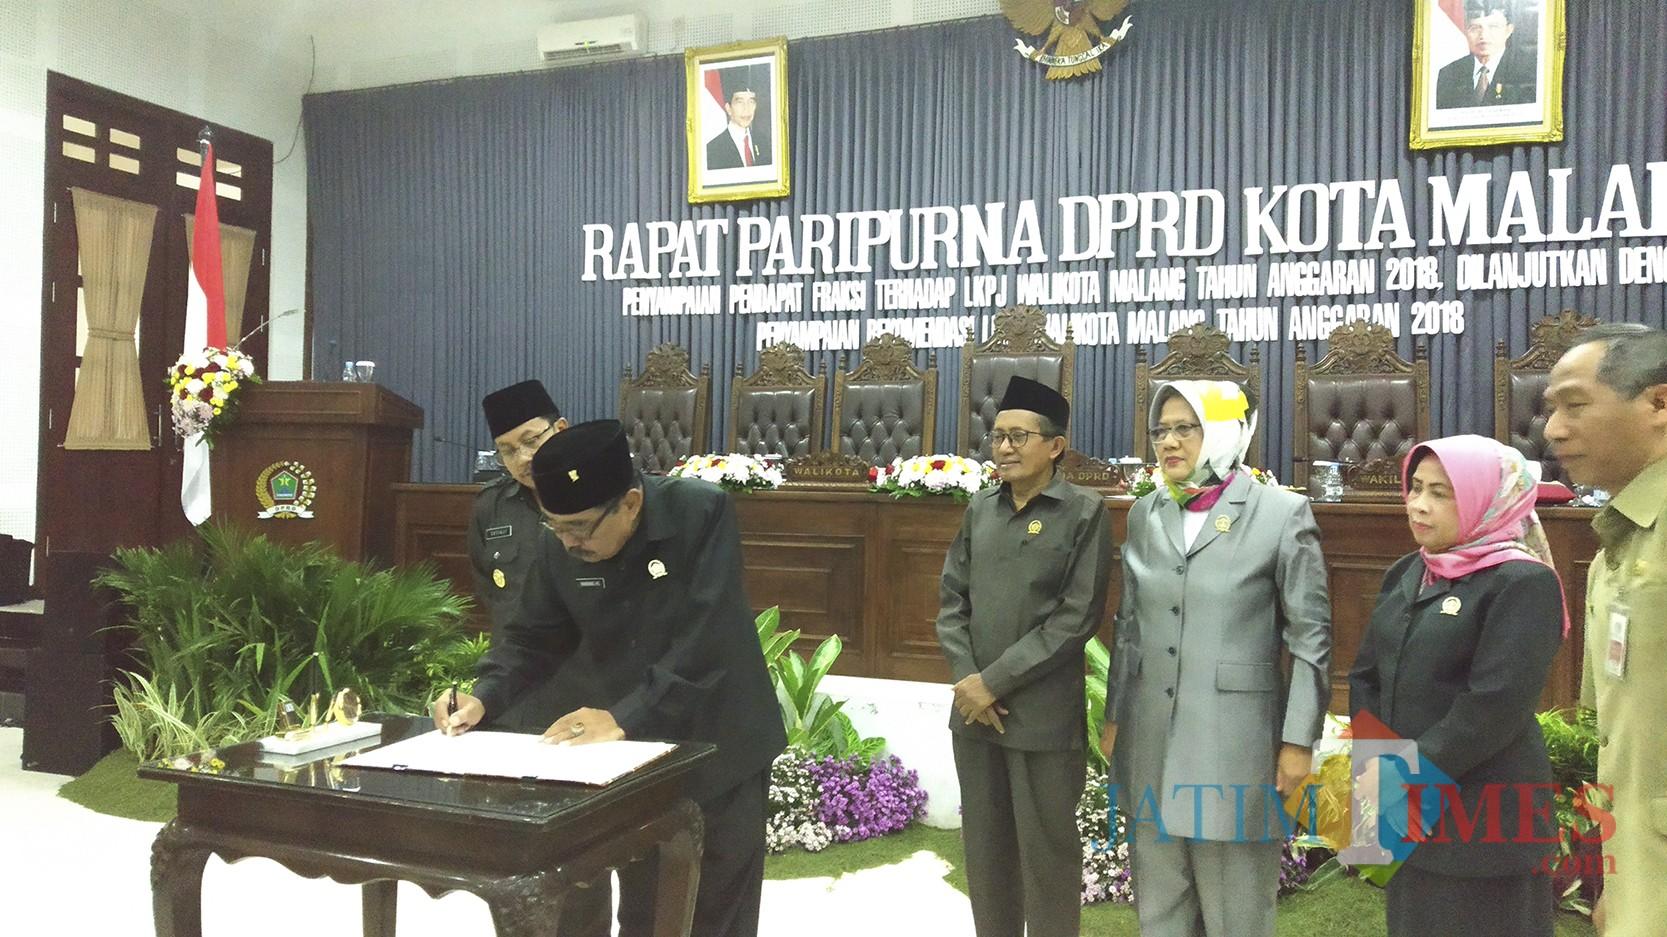 Penandatanganan dokumen LKPJ Wali Kota Malang TA 2018 oleh Ketua DPRD Kota Malang Bambang Heri Susanto. (Pipit Anggraeni/MalangTIMES).